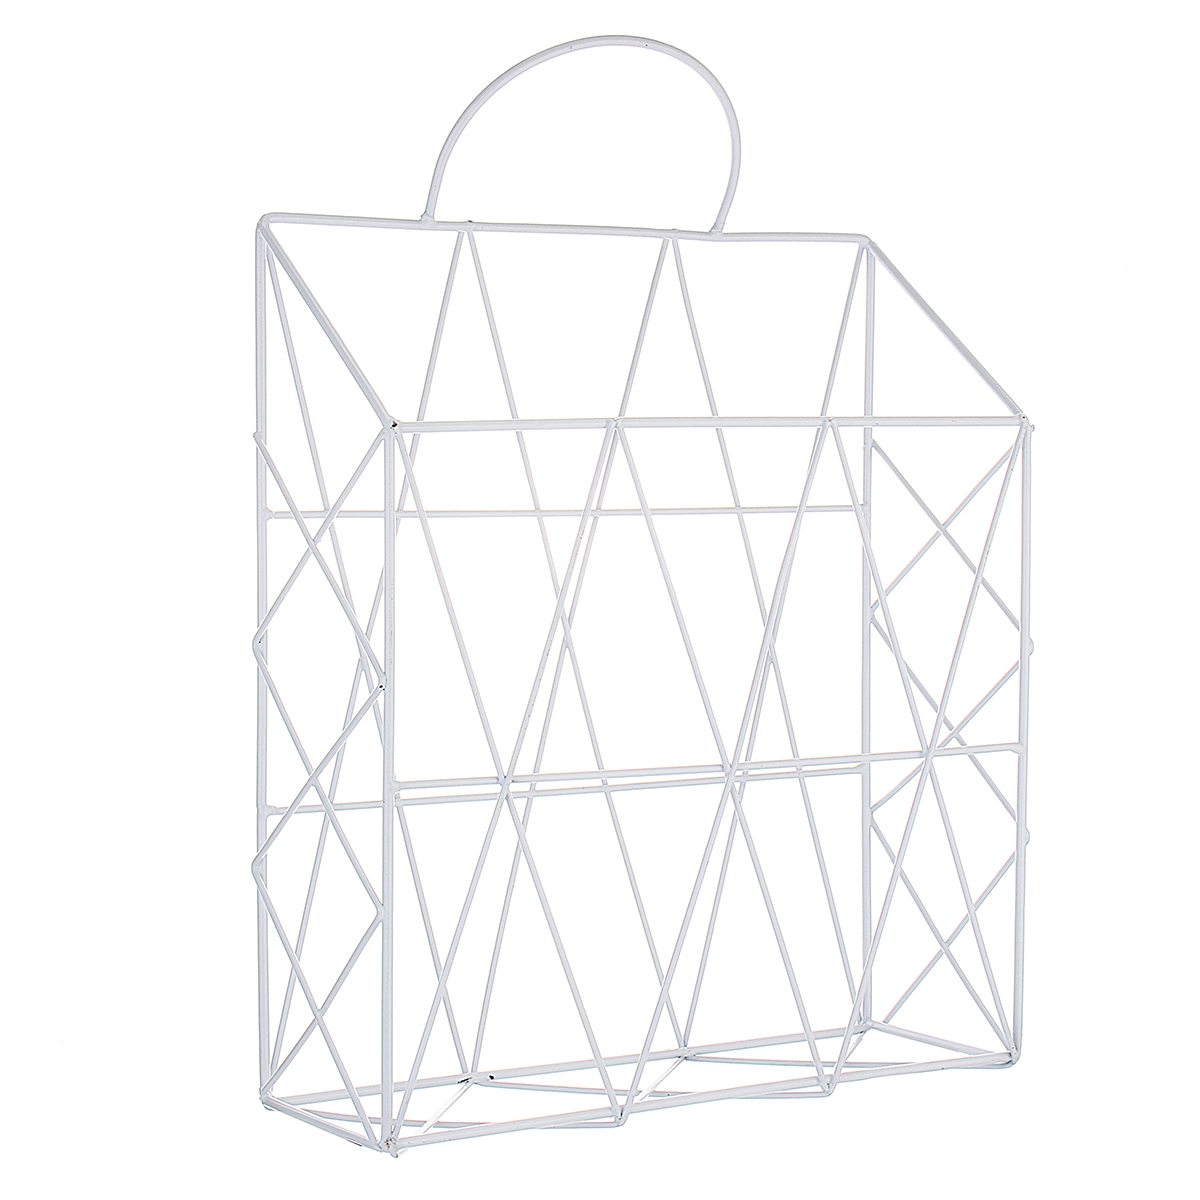 Modern Metal Wire Wall Hanging Shelf Baskets Rack